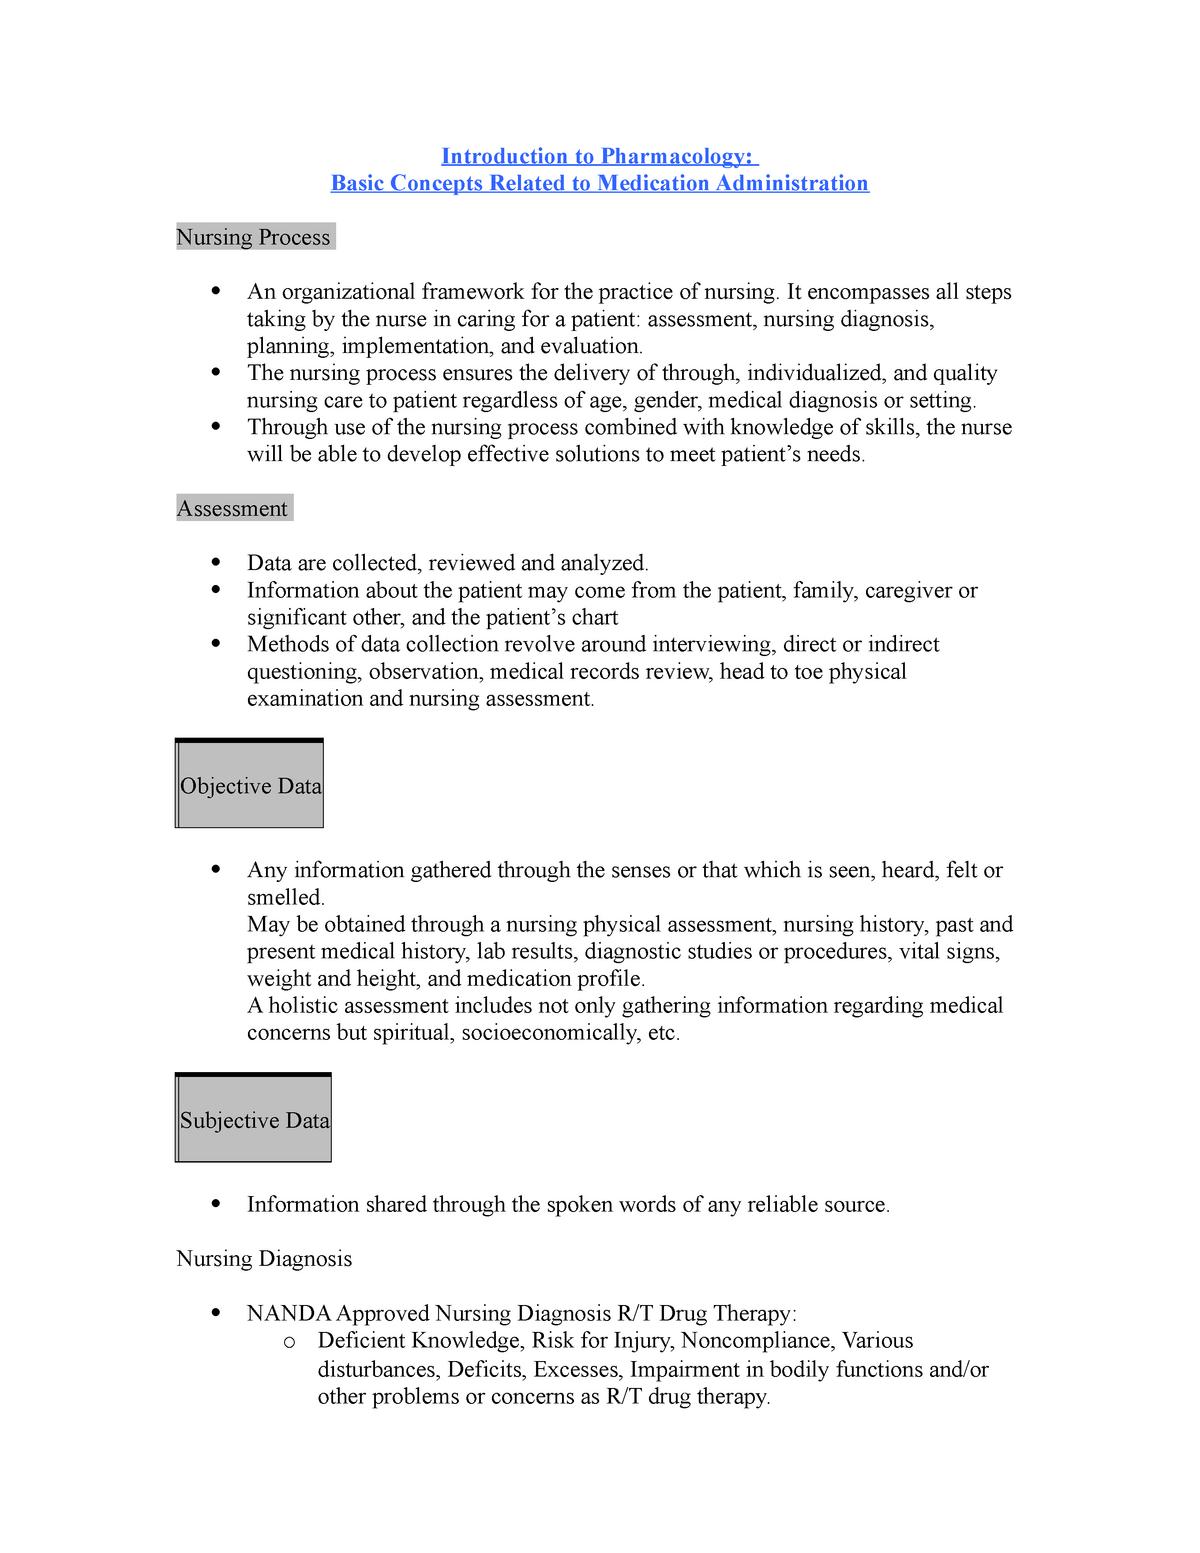 Pharm 1 EXAM 1 Notes - NUR 3191: Pharmacological Basis For Nursing